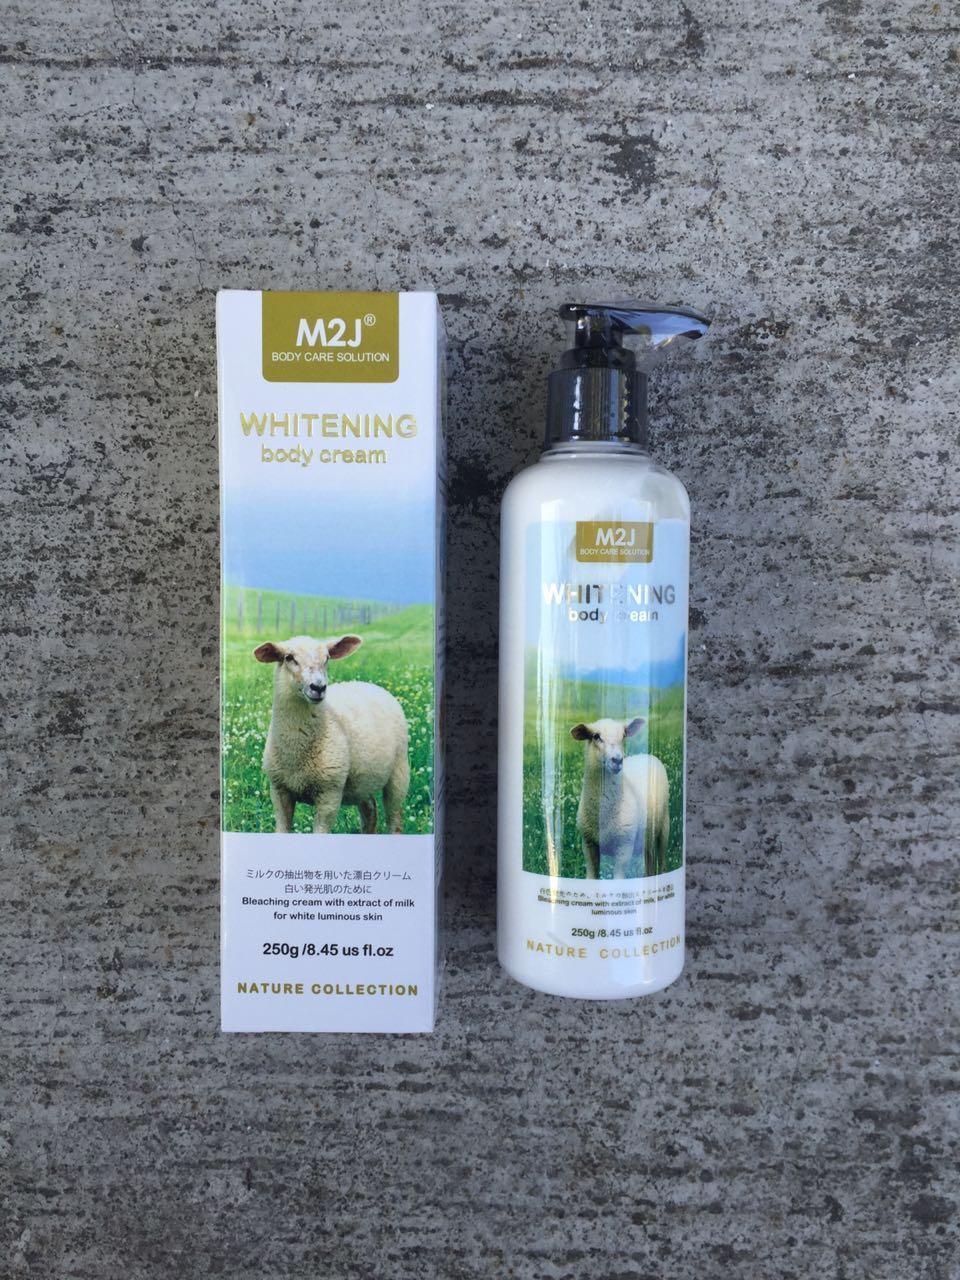 Sabun Cair Susu Domba M2J Shower Cream 500Ml N313. IDR 38,200 IDR38200. View Detail. M2J Whitening Body Cream - 250 mL